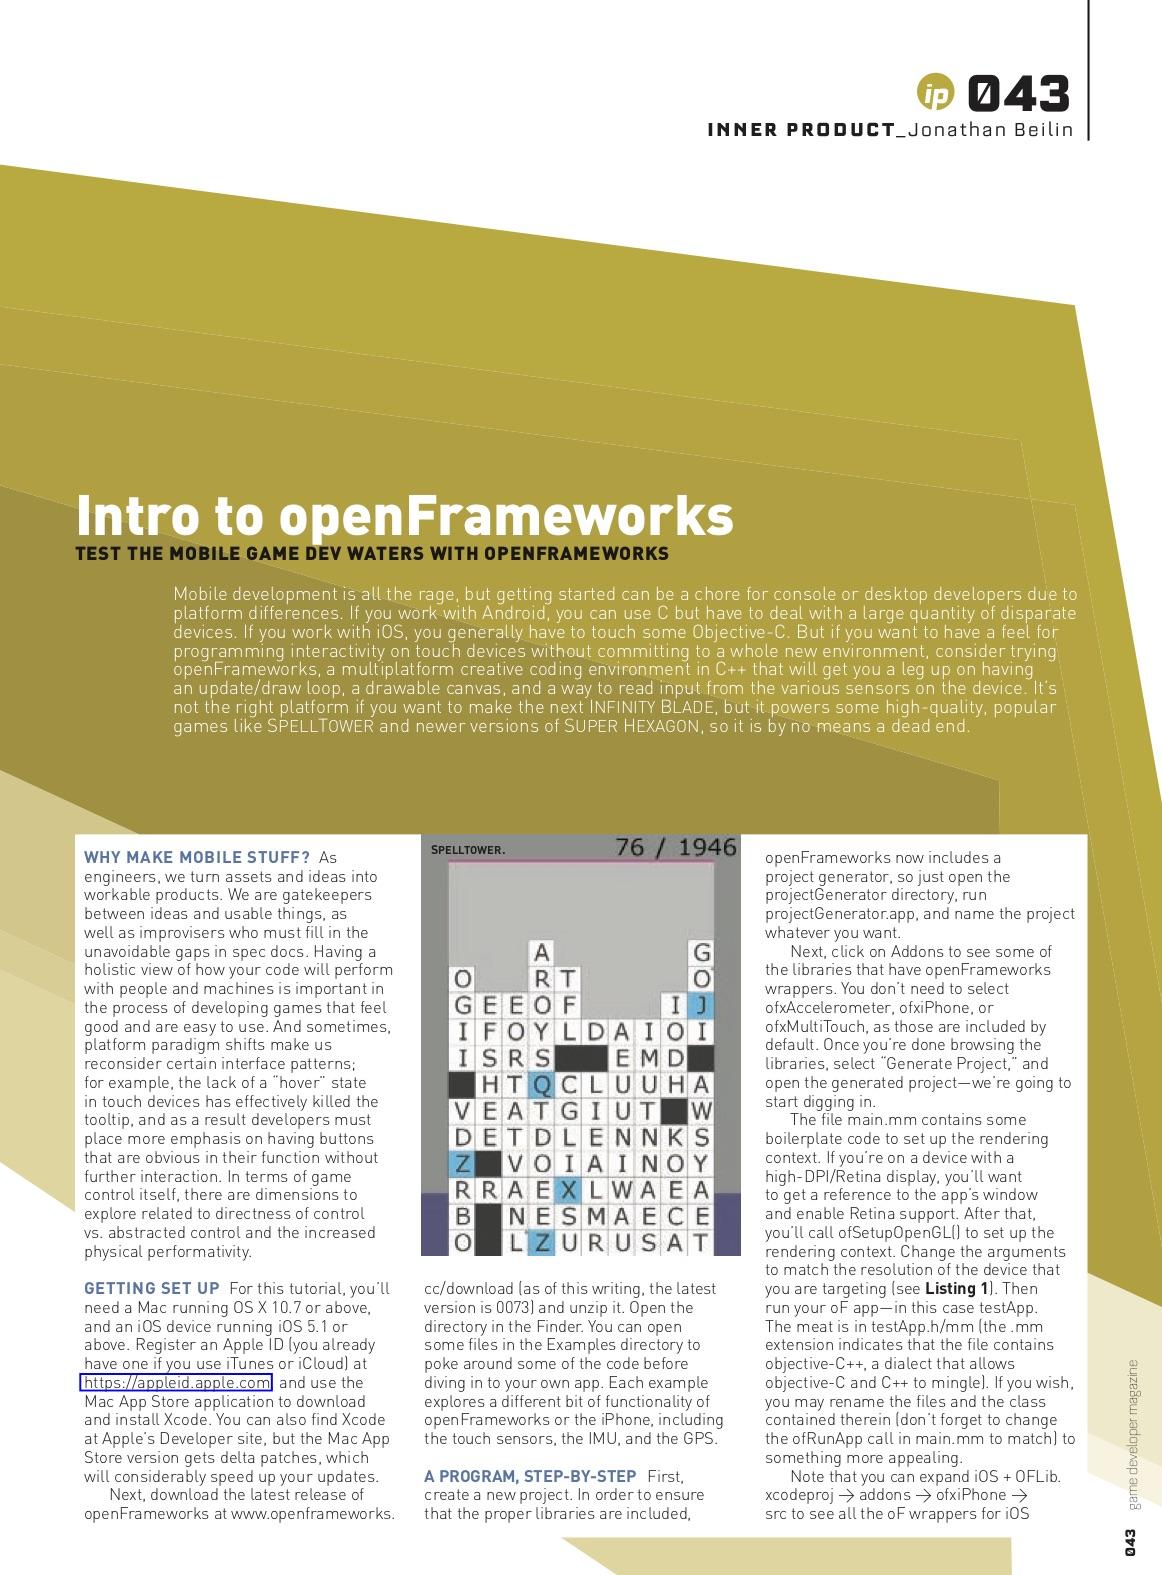 GDM_January_2013 - openFrameworks article 02.jpg